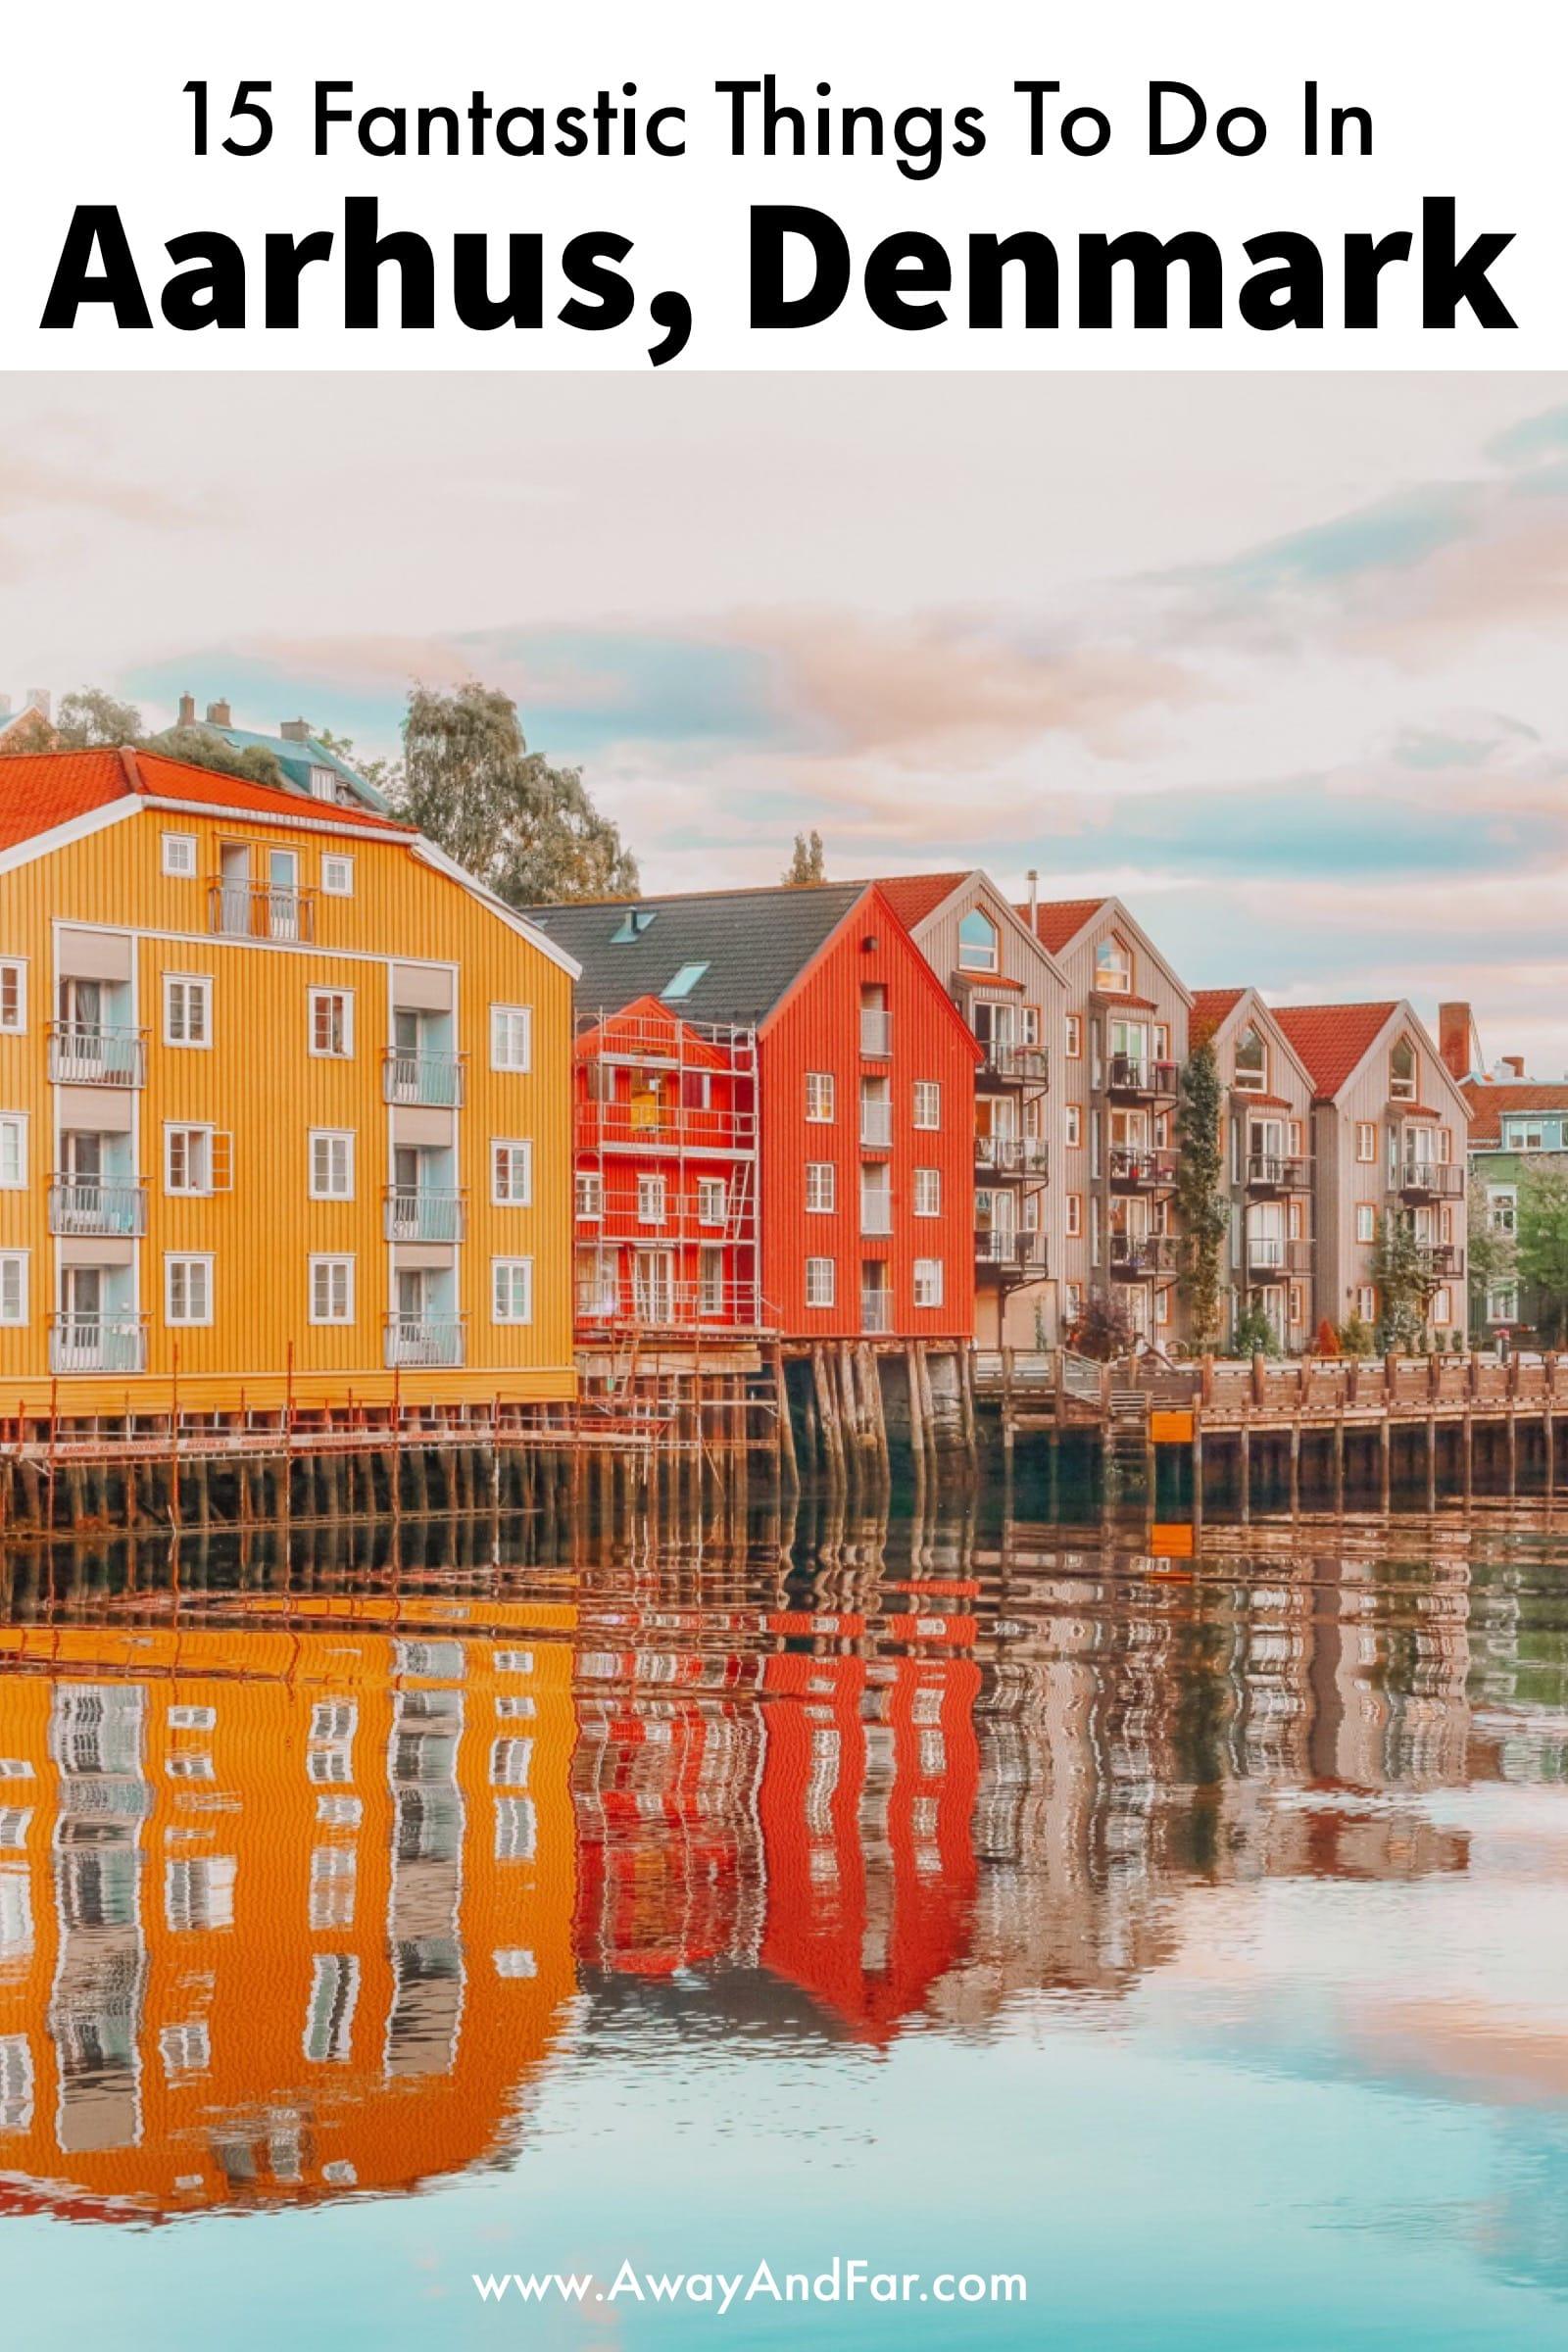 15 Best Things To Do In Aarhus, Denmark (1)